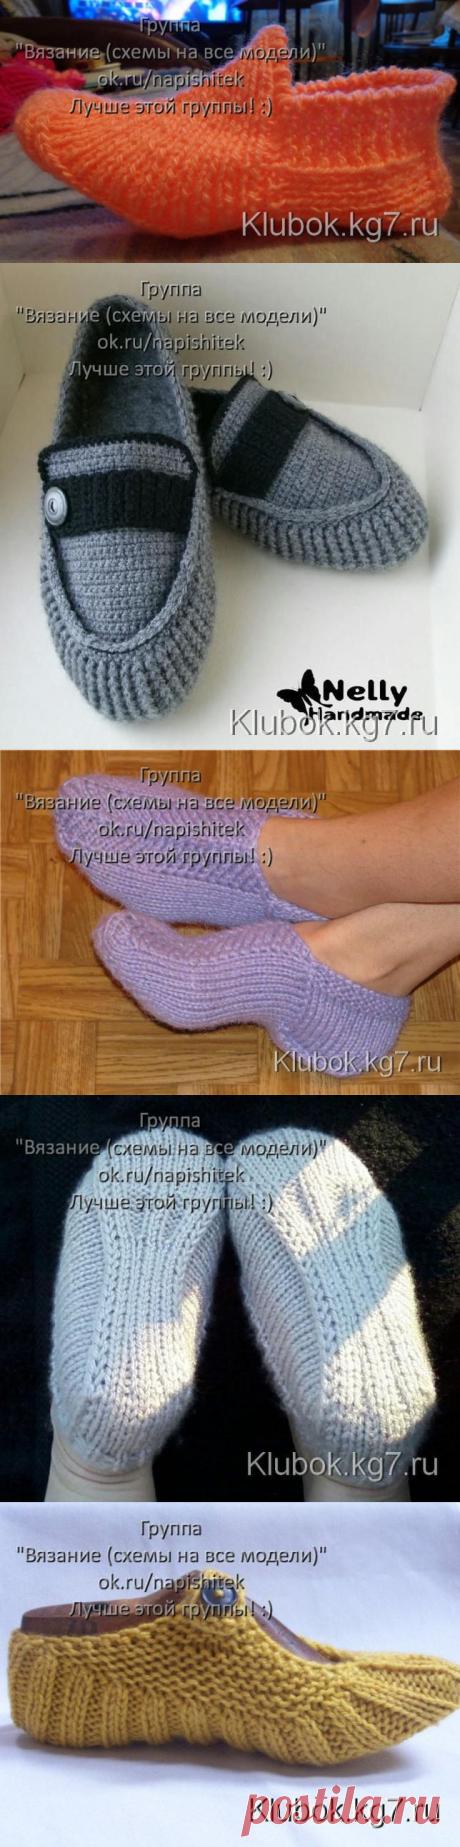 Тапочки, носки, гольфы   Клубок